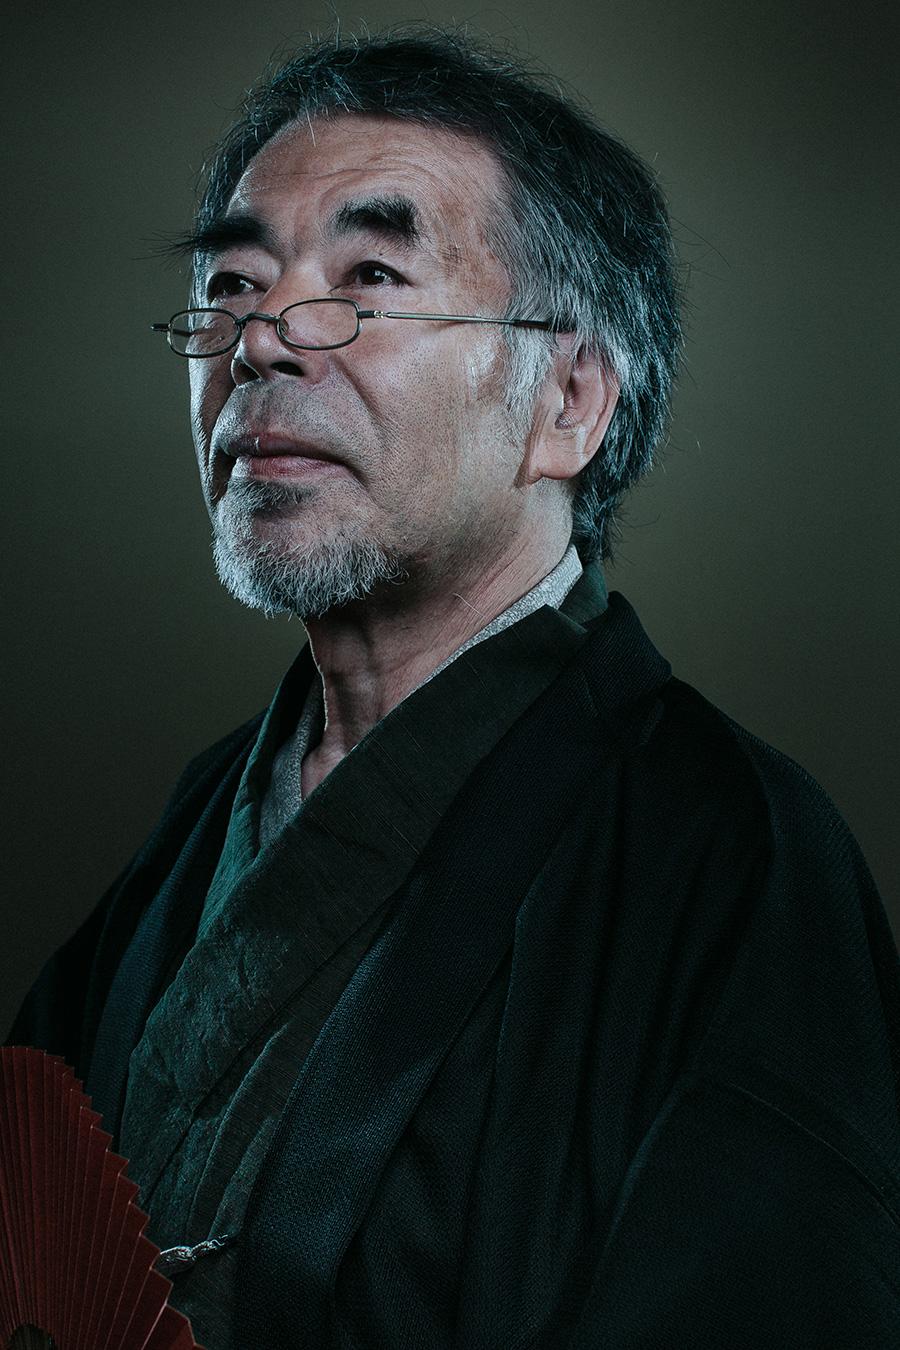 Funkydali.com - Editorial - Prestige - Malaysia - Akira Yamamoto.jpg